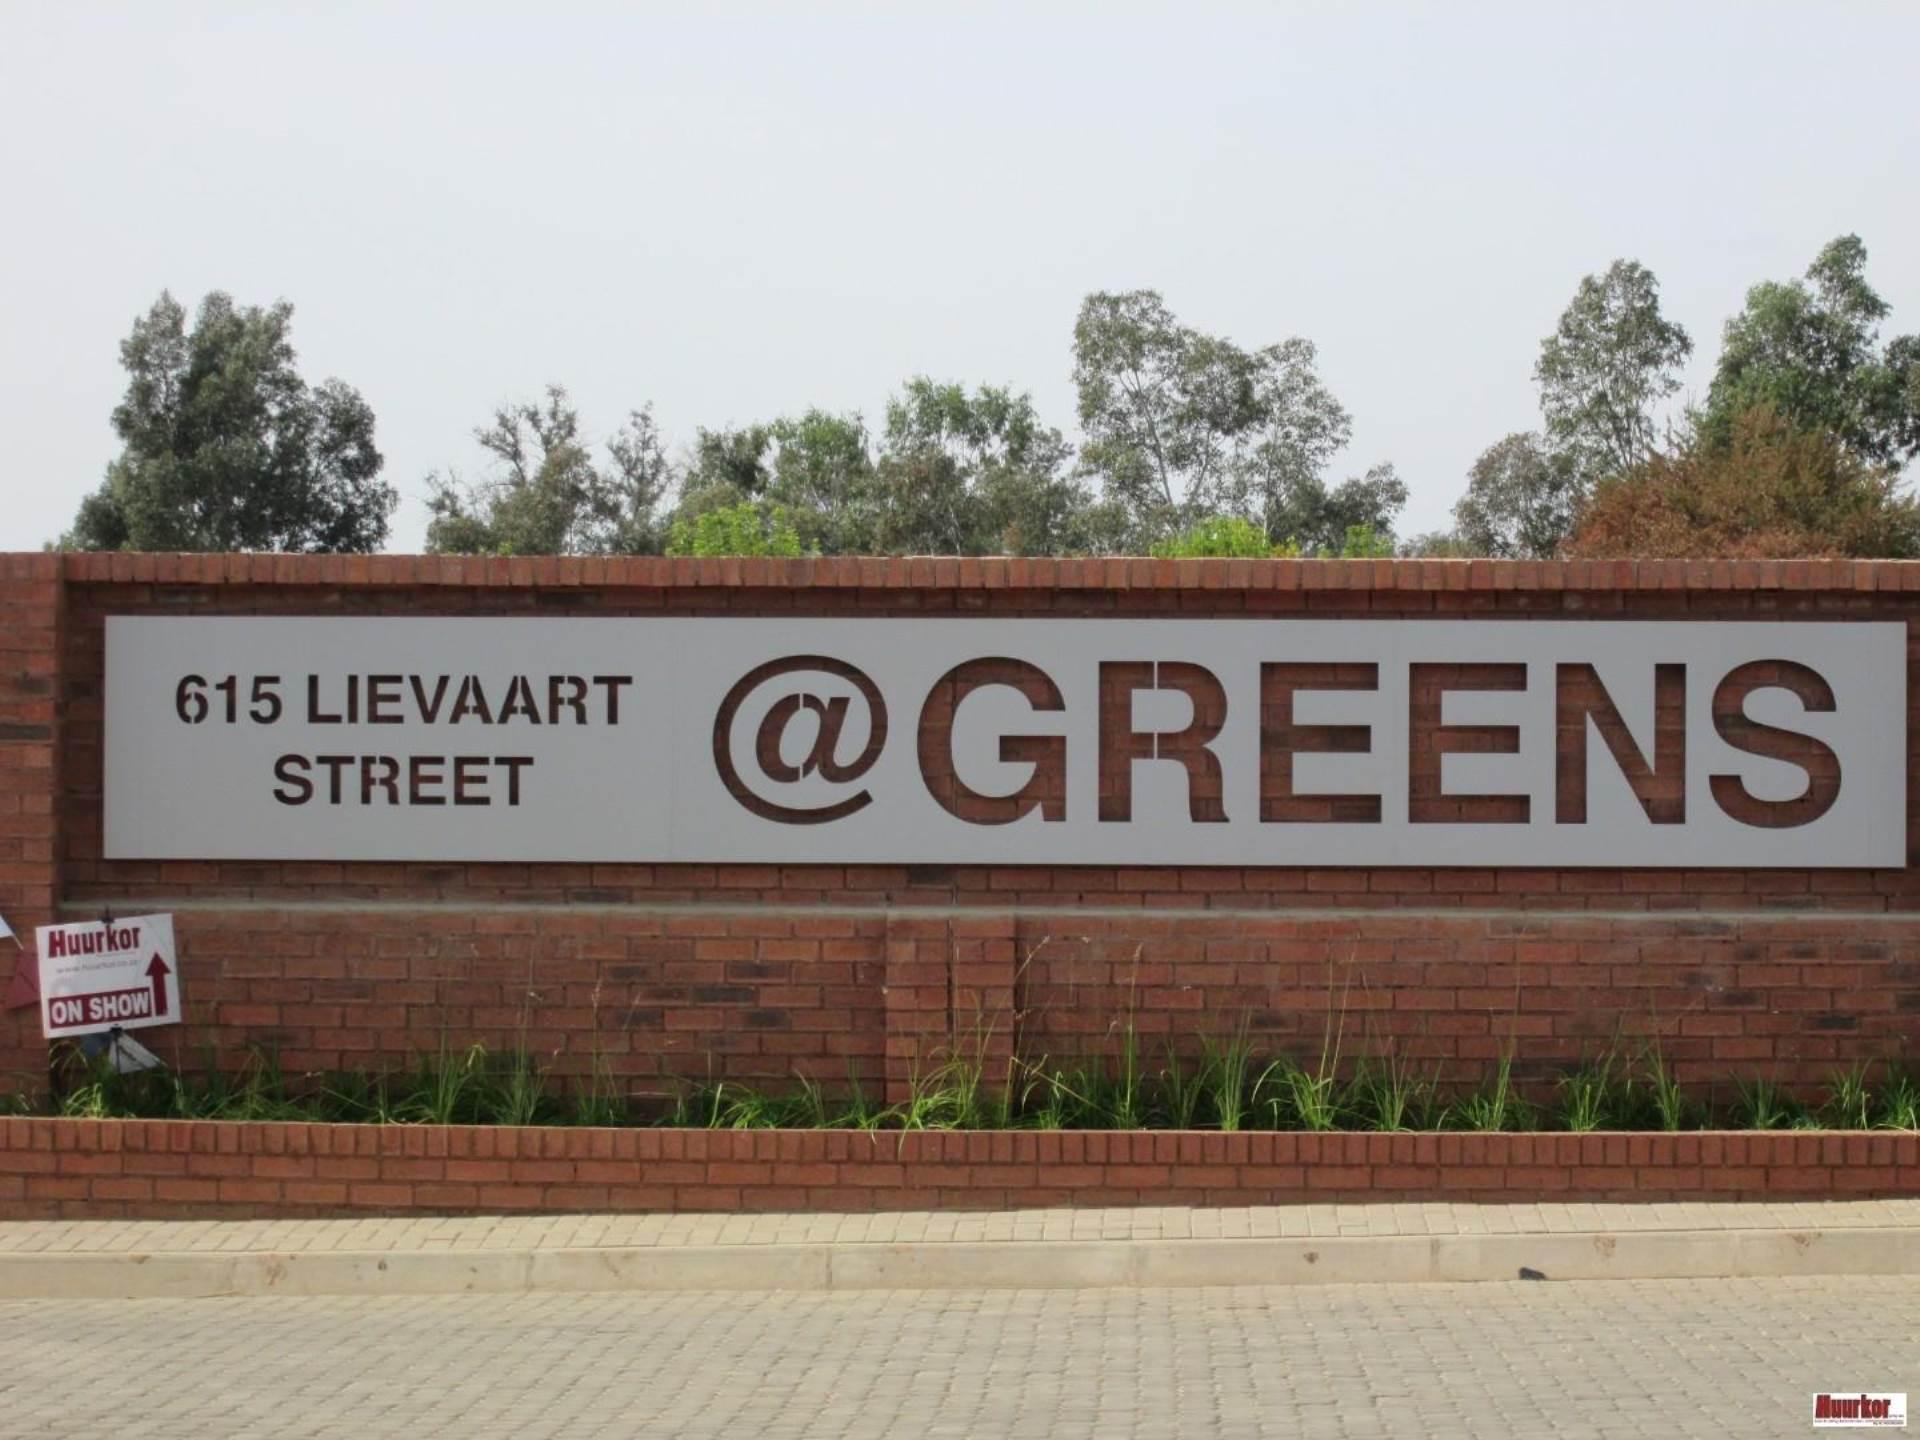 Flat To Rent In Philip Nel Park Pretoria For R 5 250